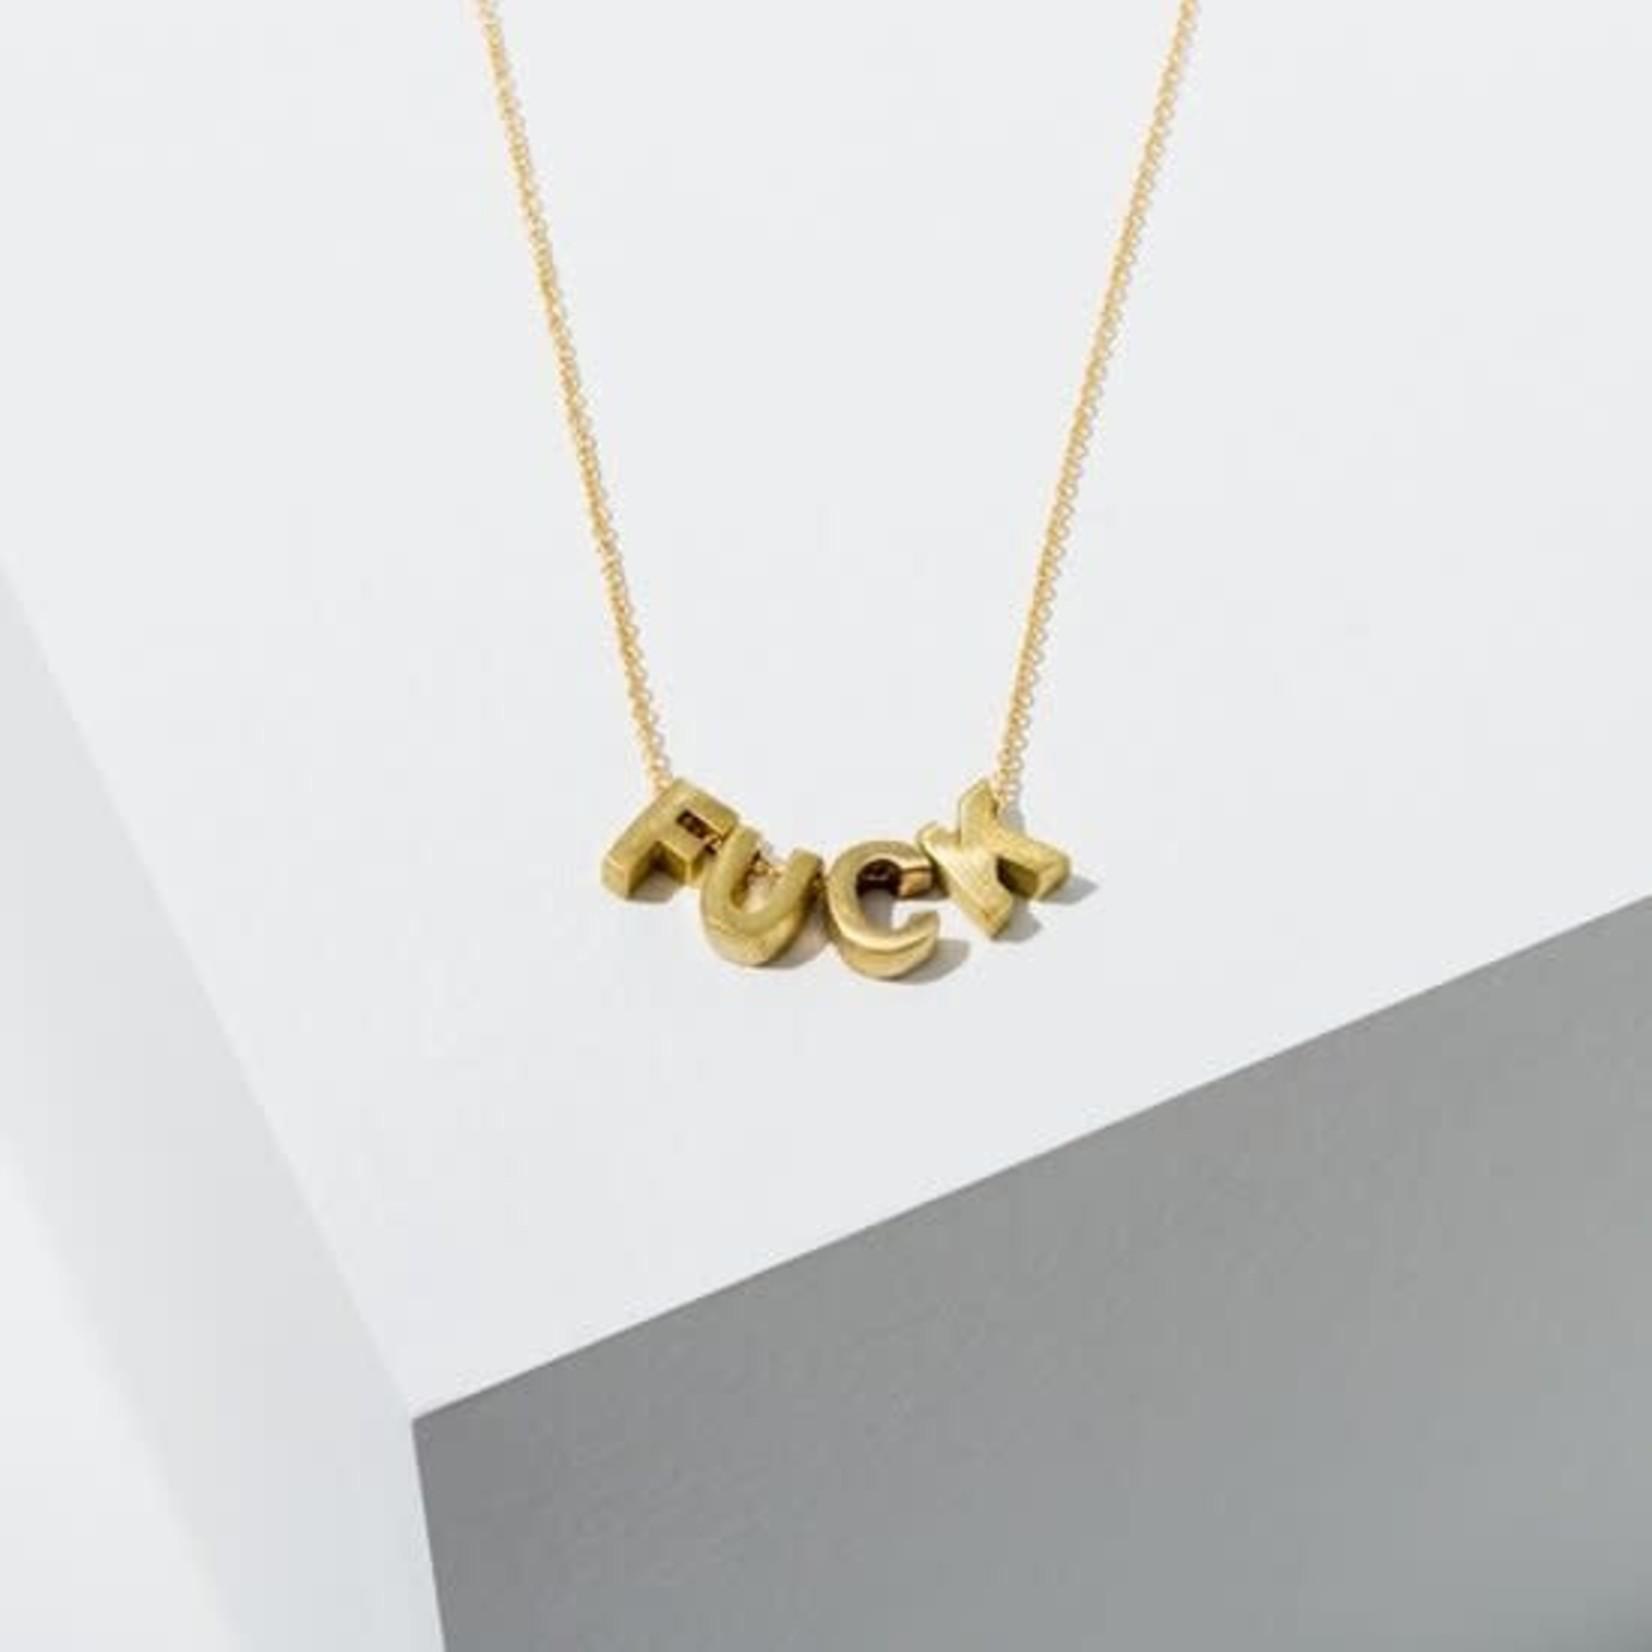 Fuck Necklace